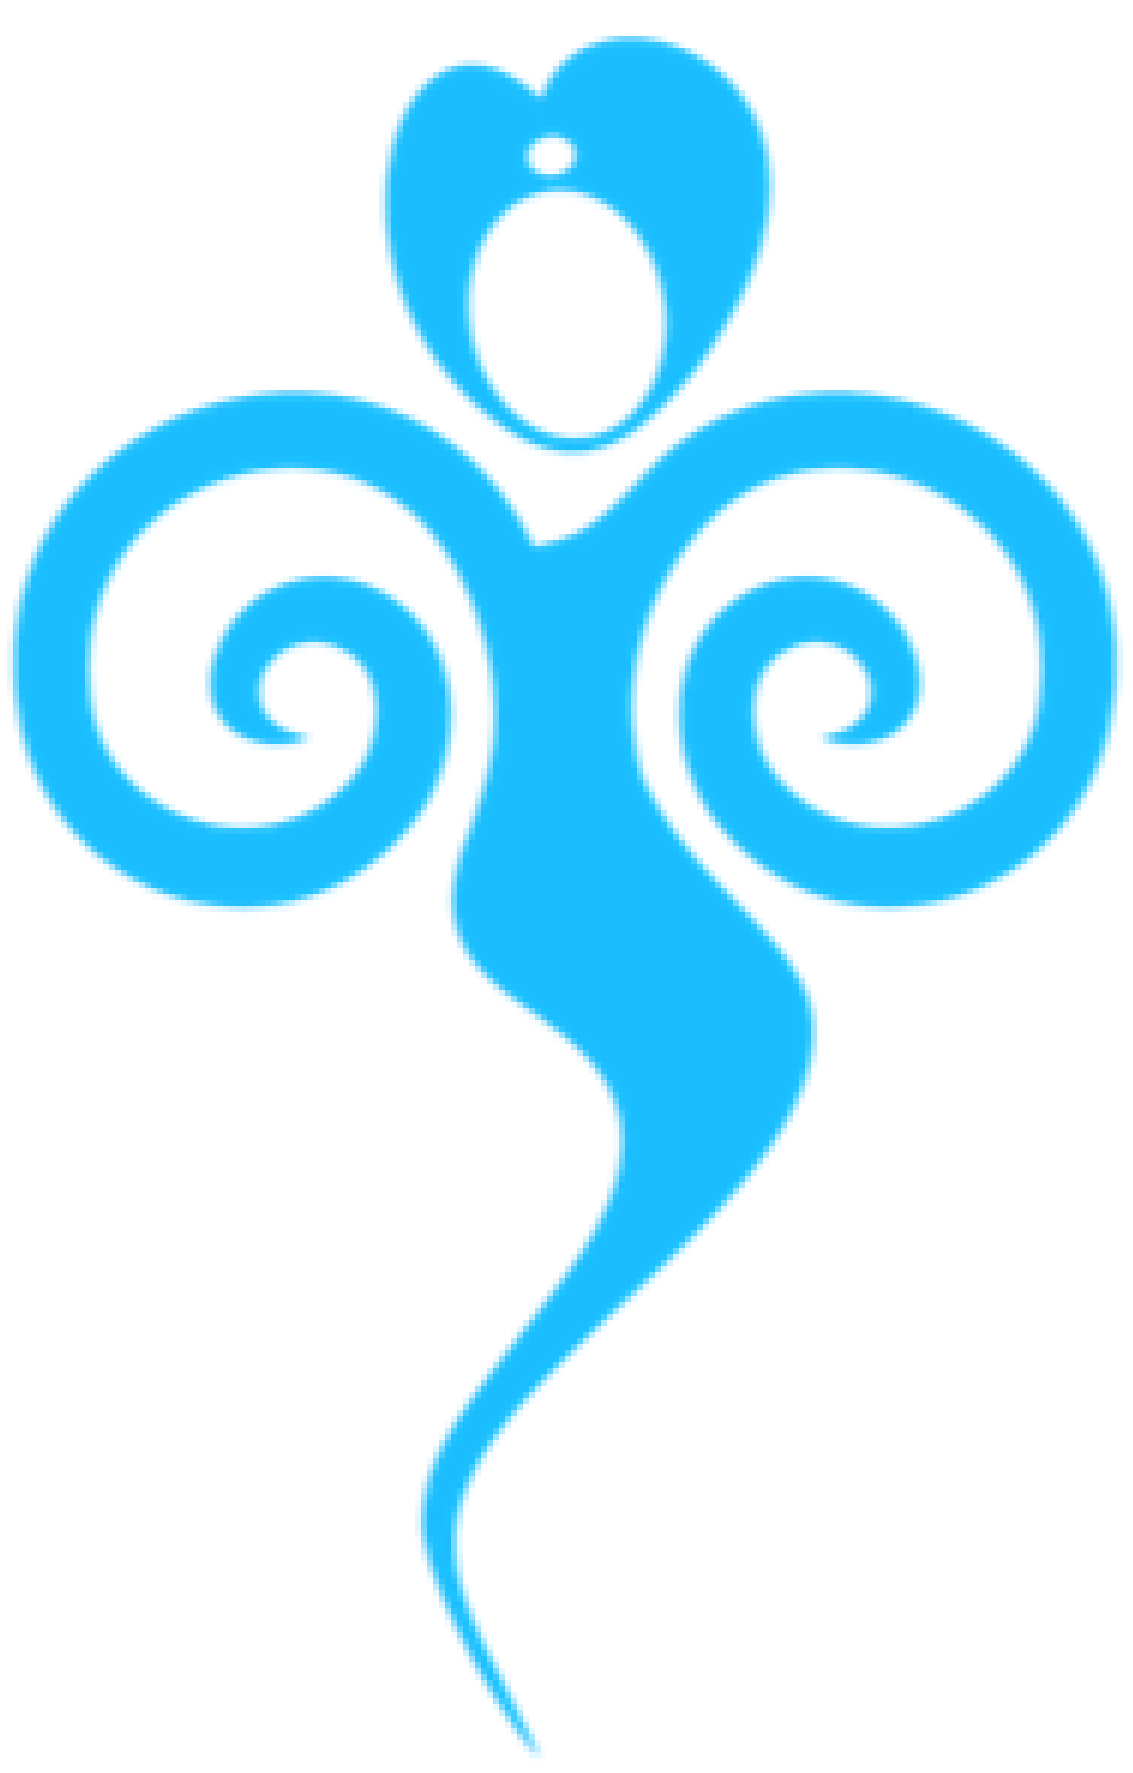 logoscopic-icon